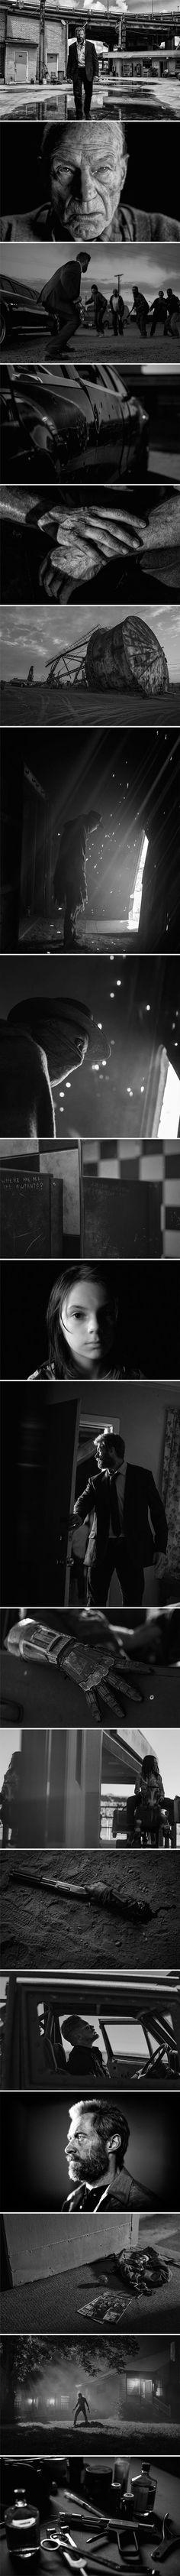 Logan [Noir] (2017) ● Director - James Mangold ● Cinematographer - John Mathieson